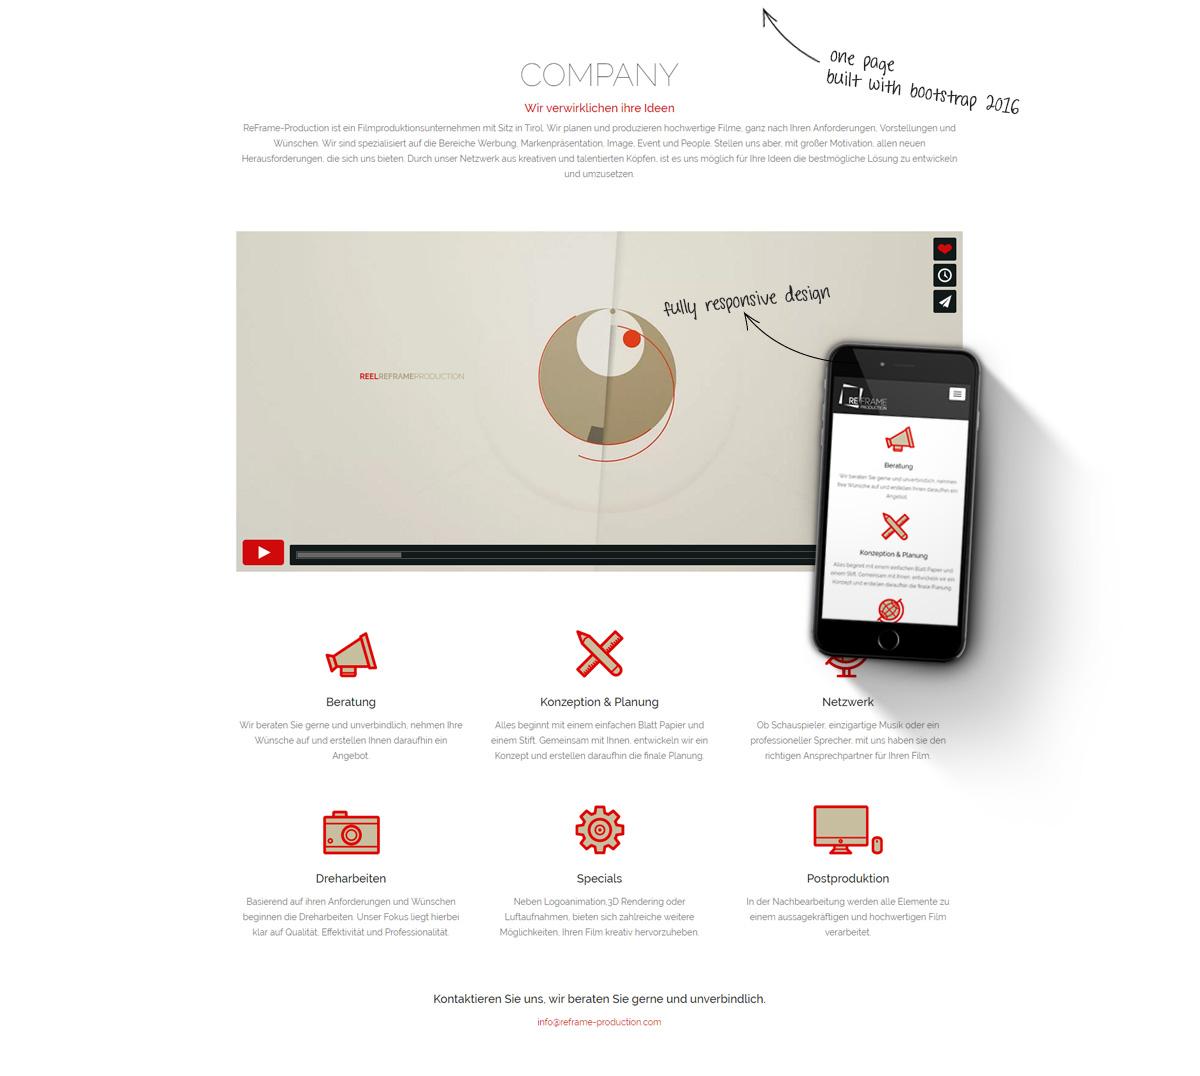 siti web reframe production